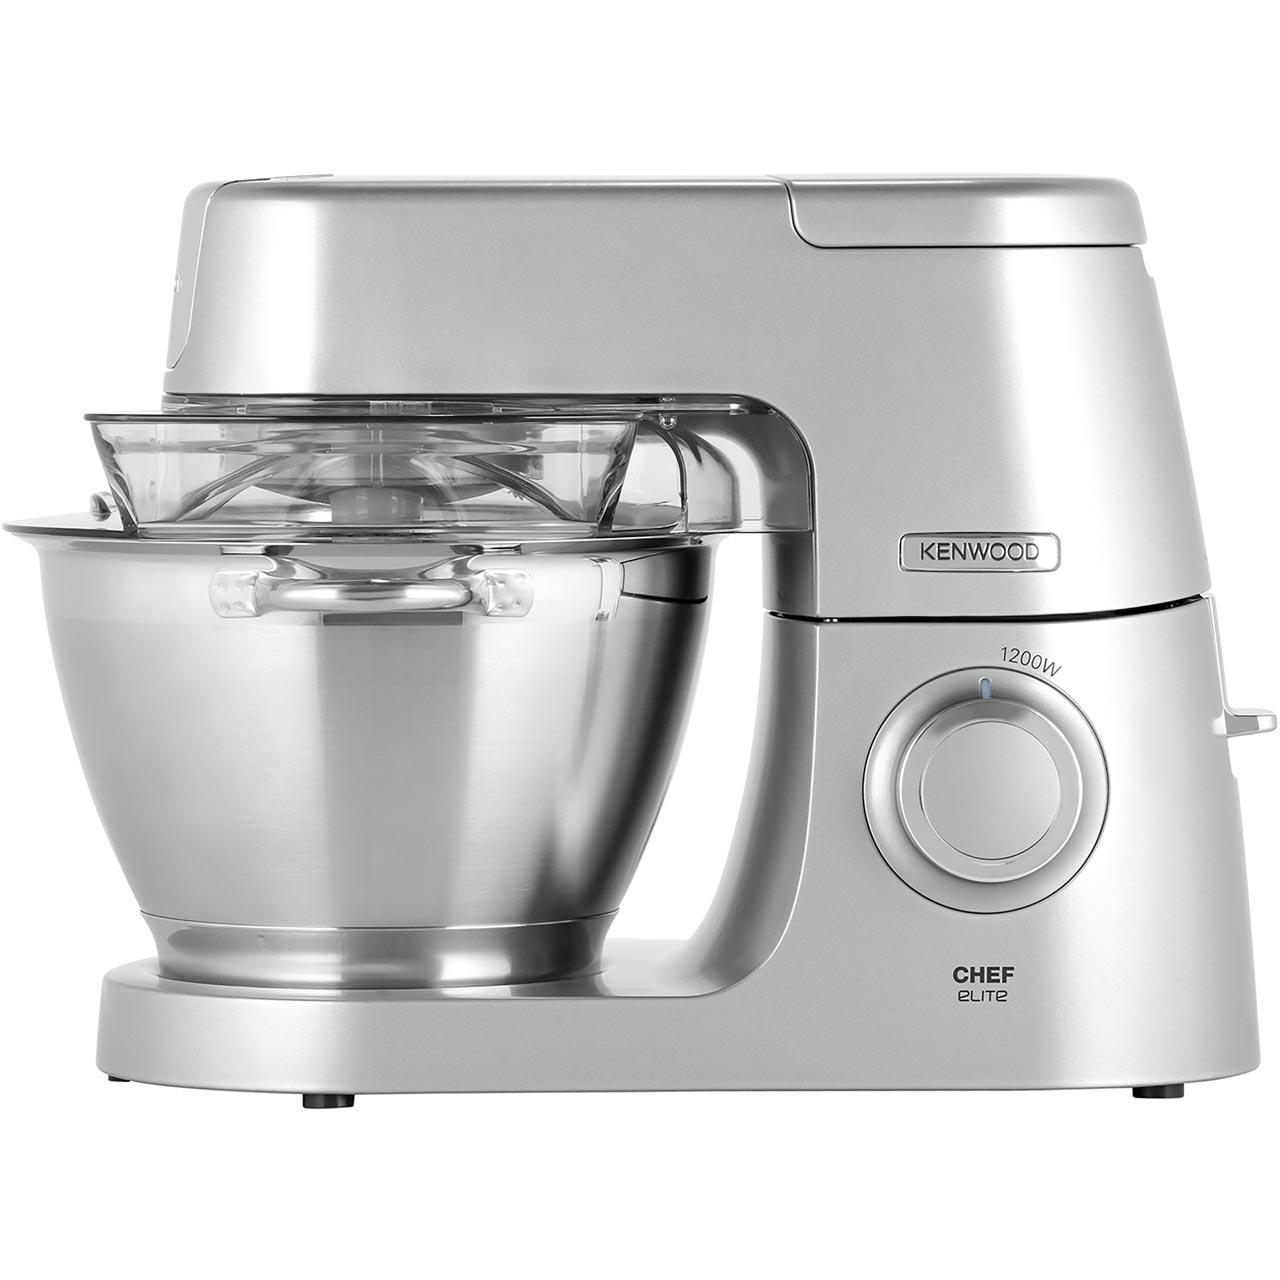 Kenwood Chef Elite Kvc5100s Kitchen Machine Silver